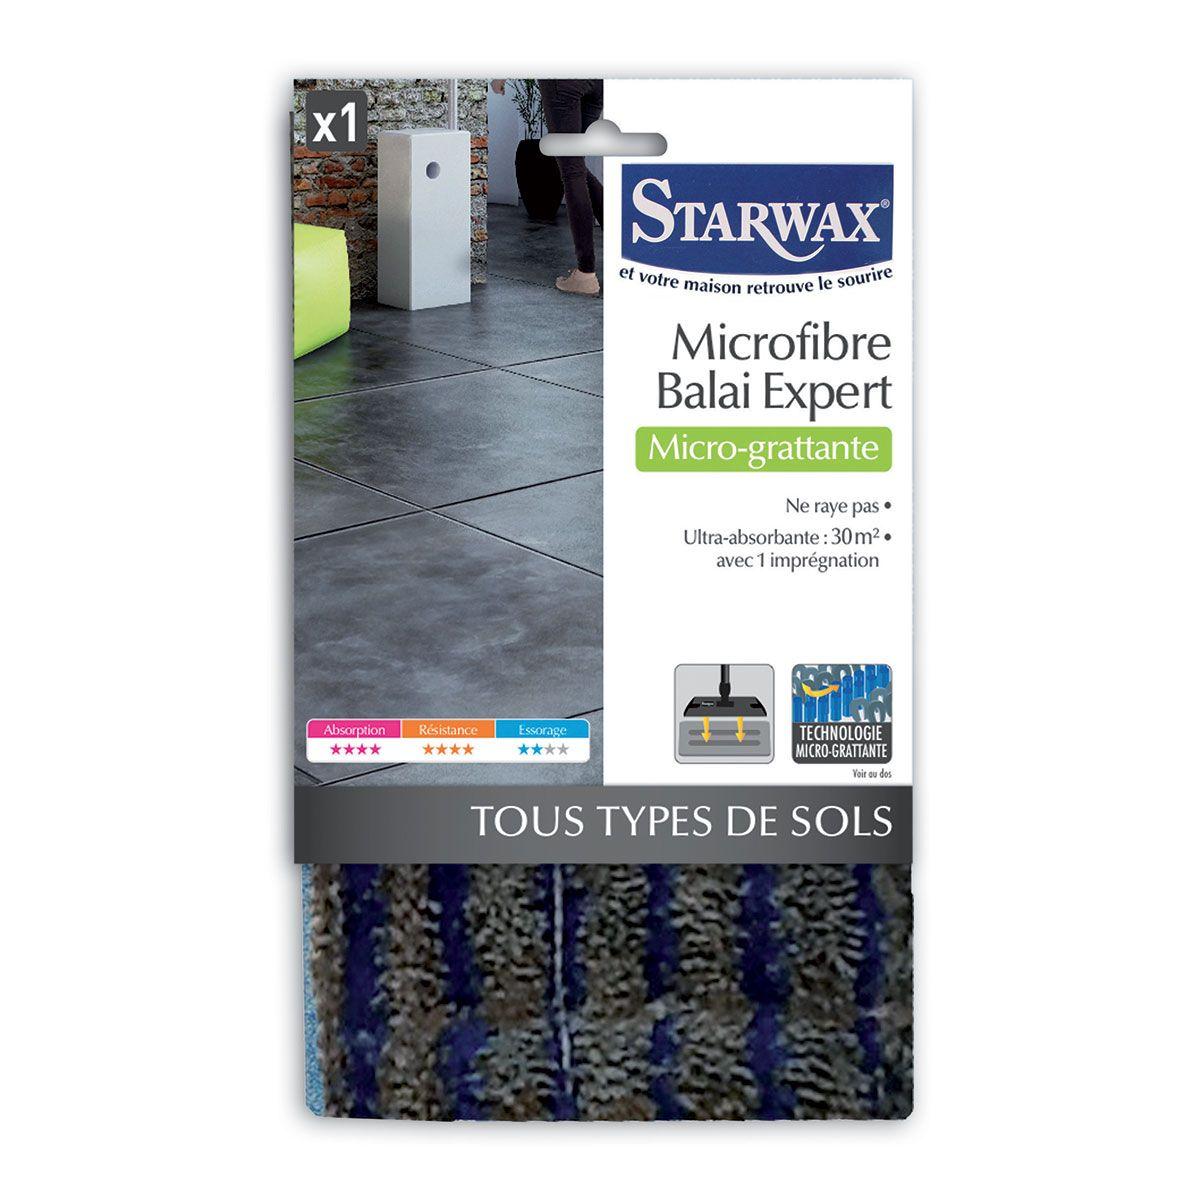 Microfibre micro-grattante pour tous types de sols - Starwax